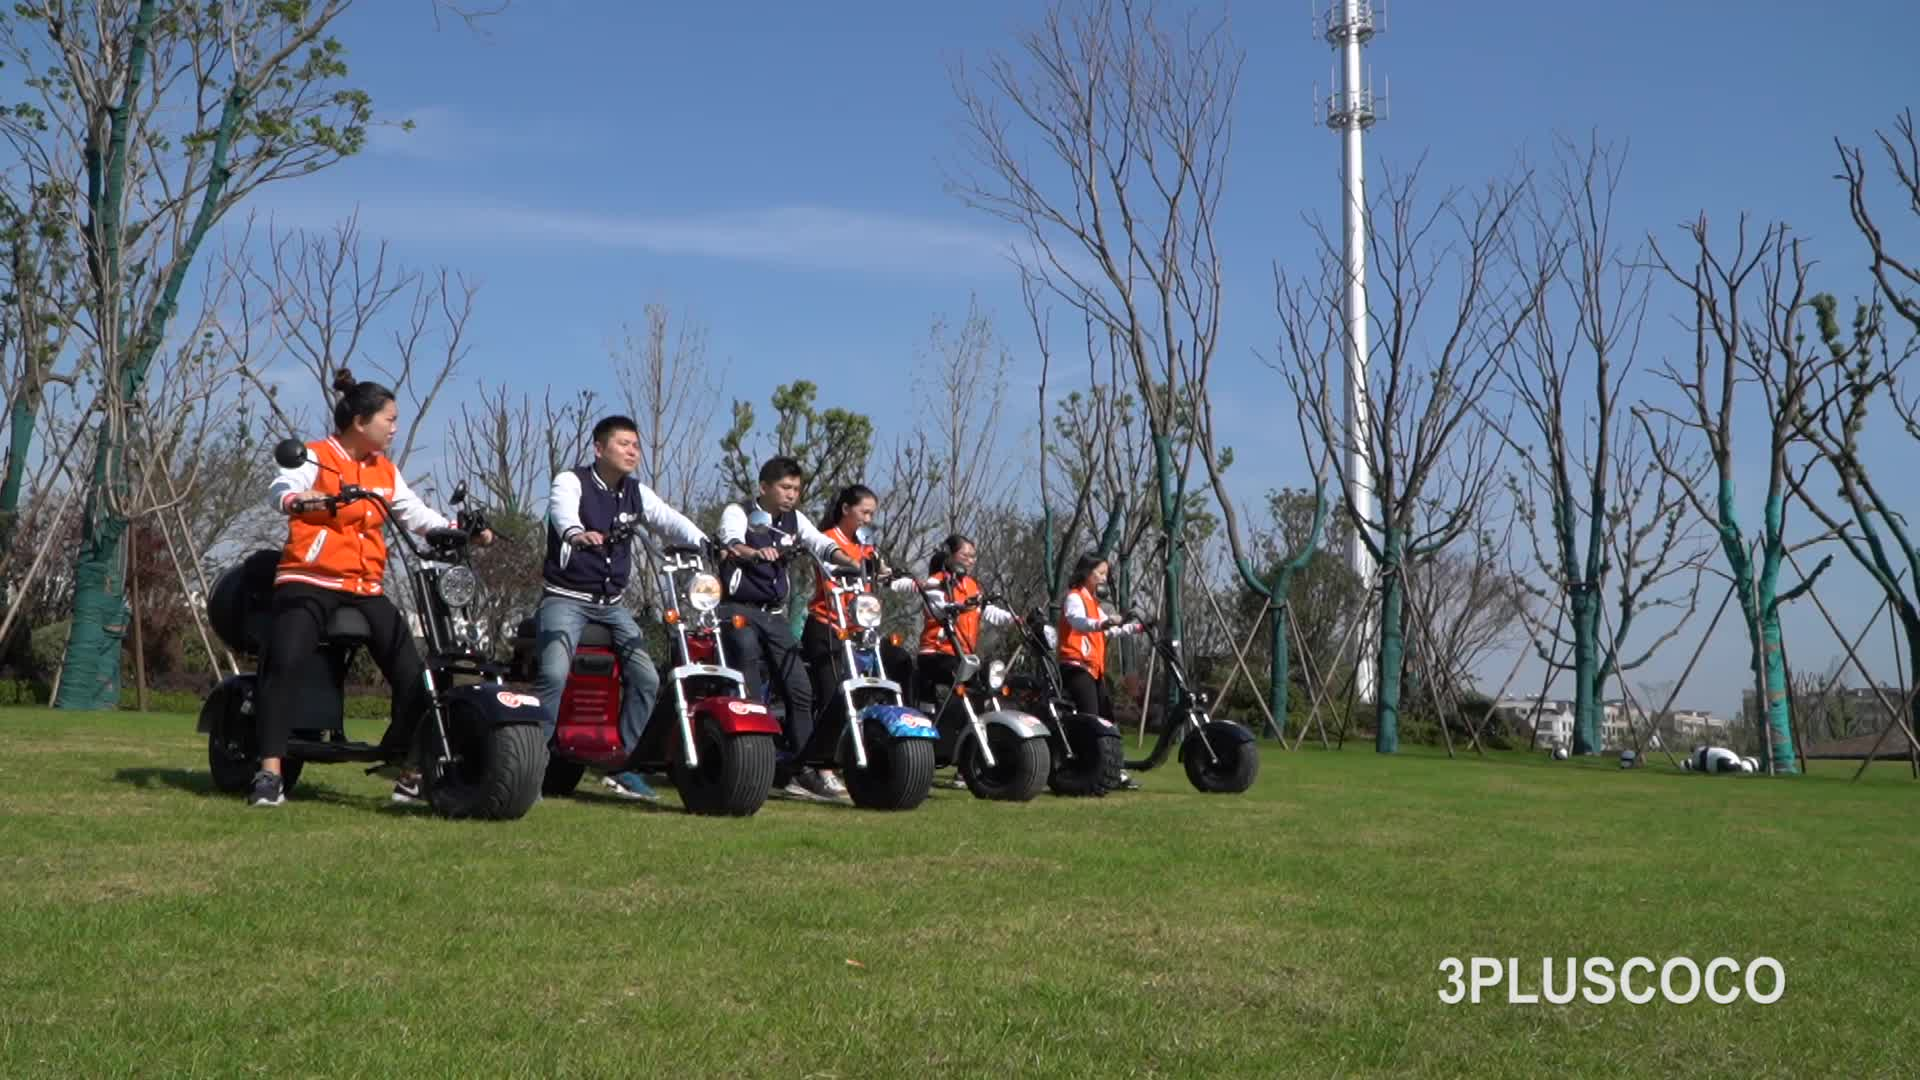 1500 w citycoco 60 V 20AH bateria scooter elétrico com grande pneu removível